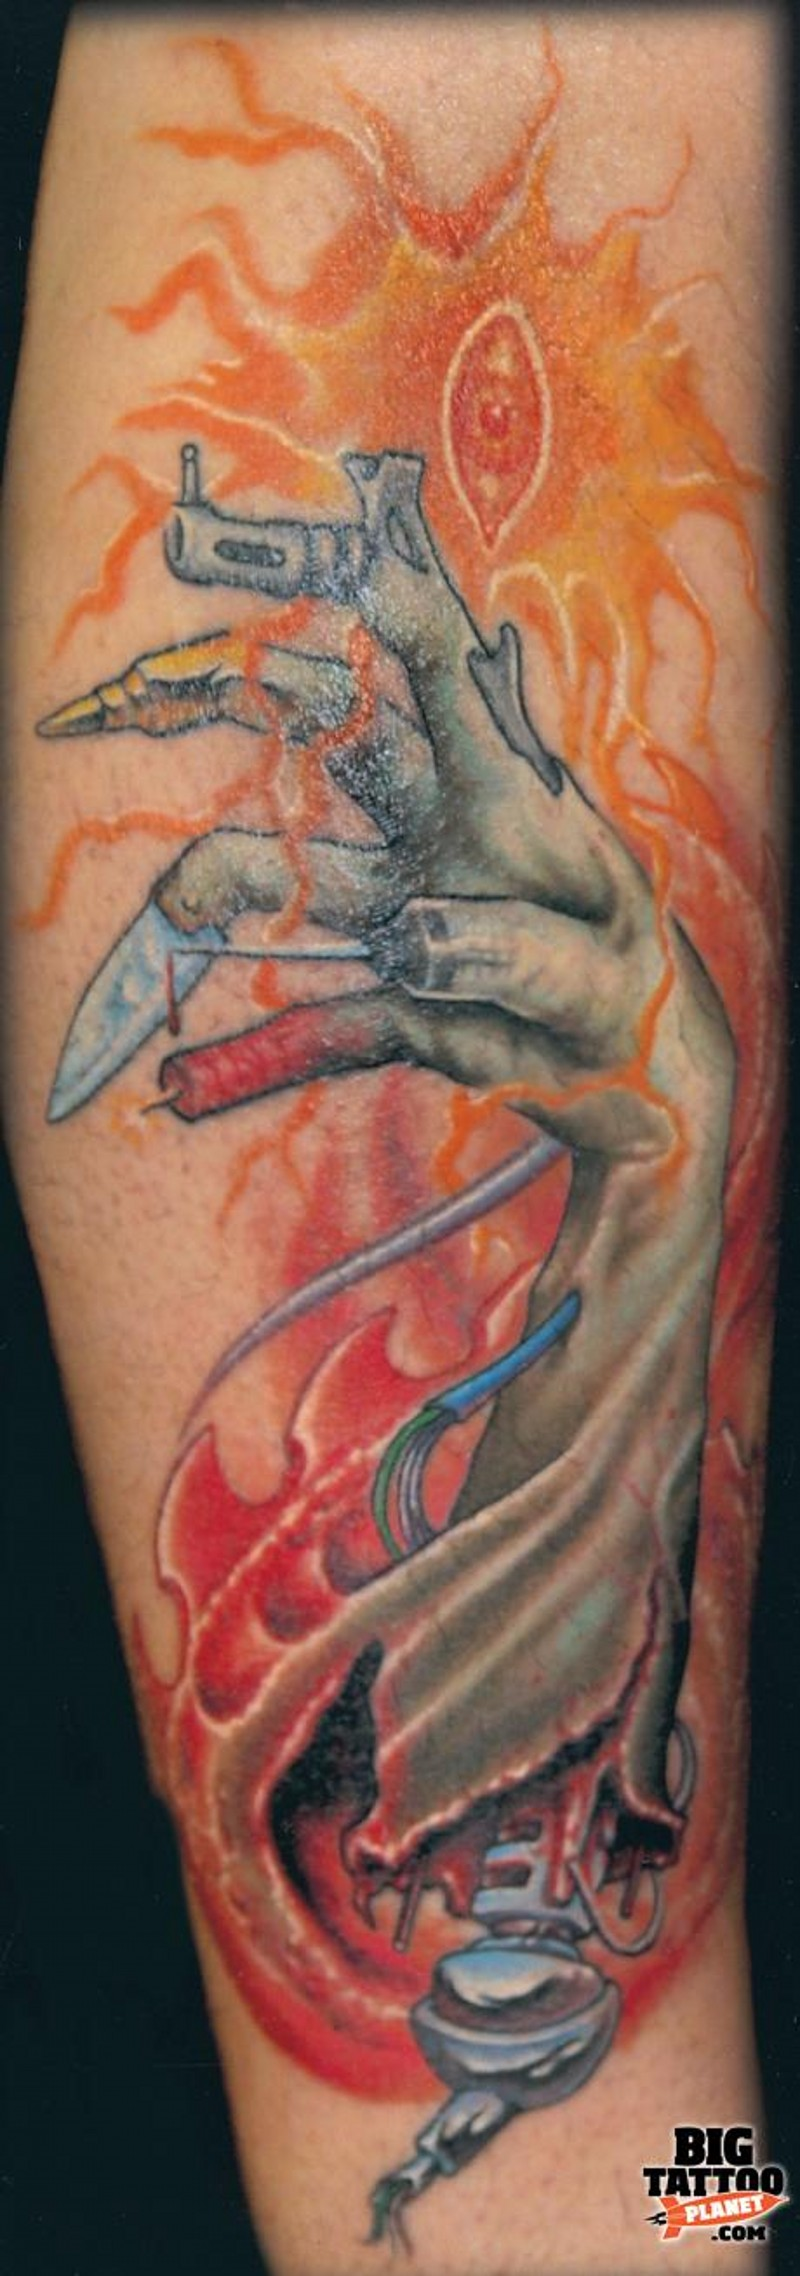 Colorful forearm tattoo of creepy biomechanical arm hand tattoo